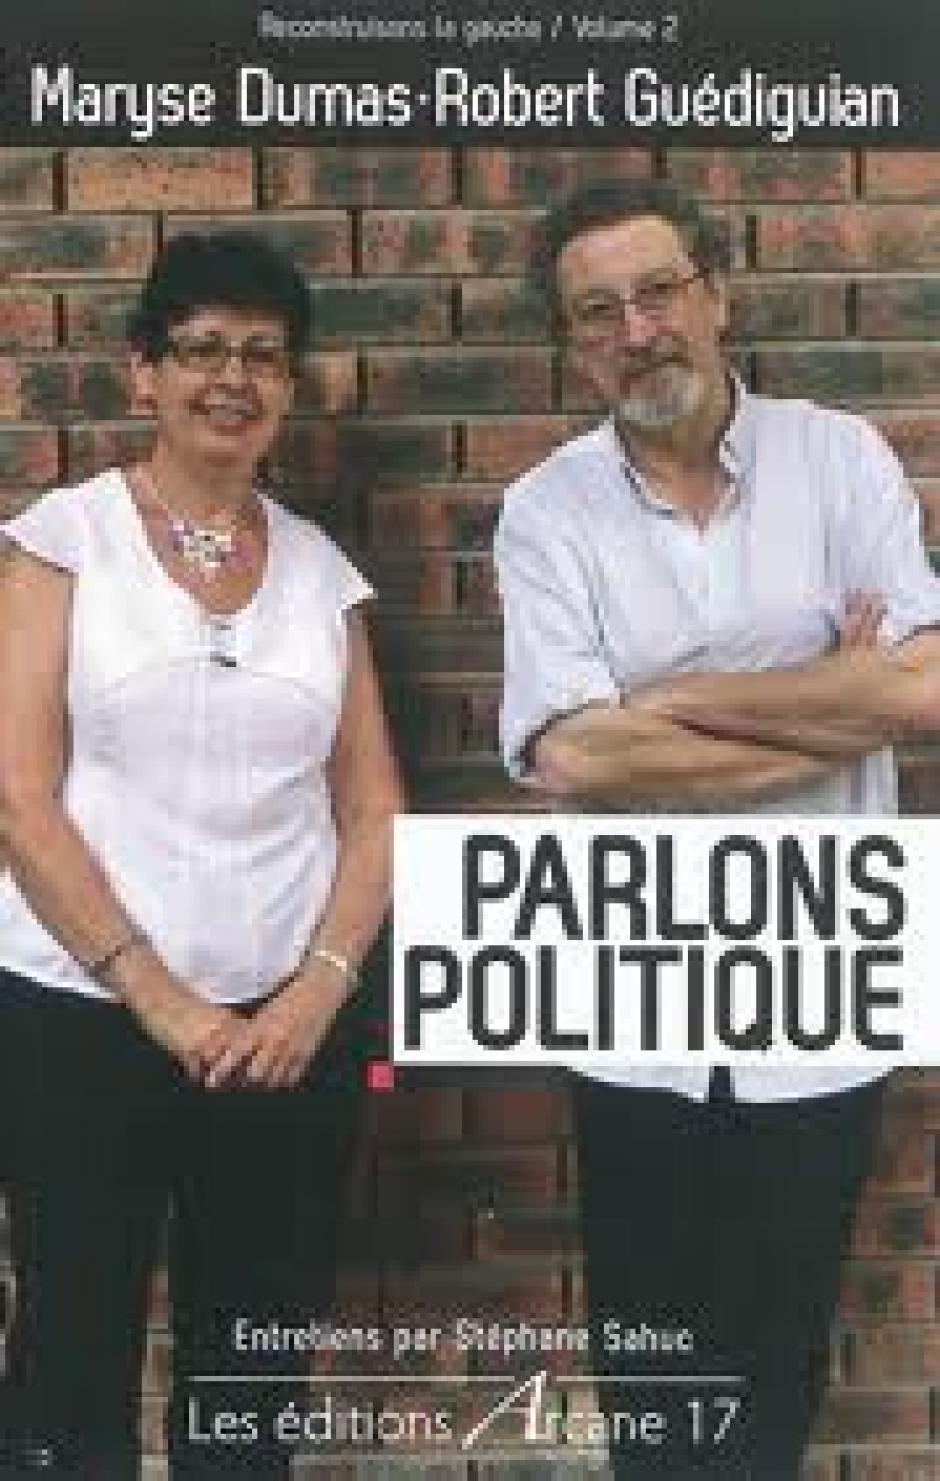 Parlons politique Arcane 17, 2011 Robert Guédiguian, Maryse Dumas